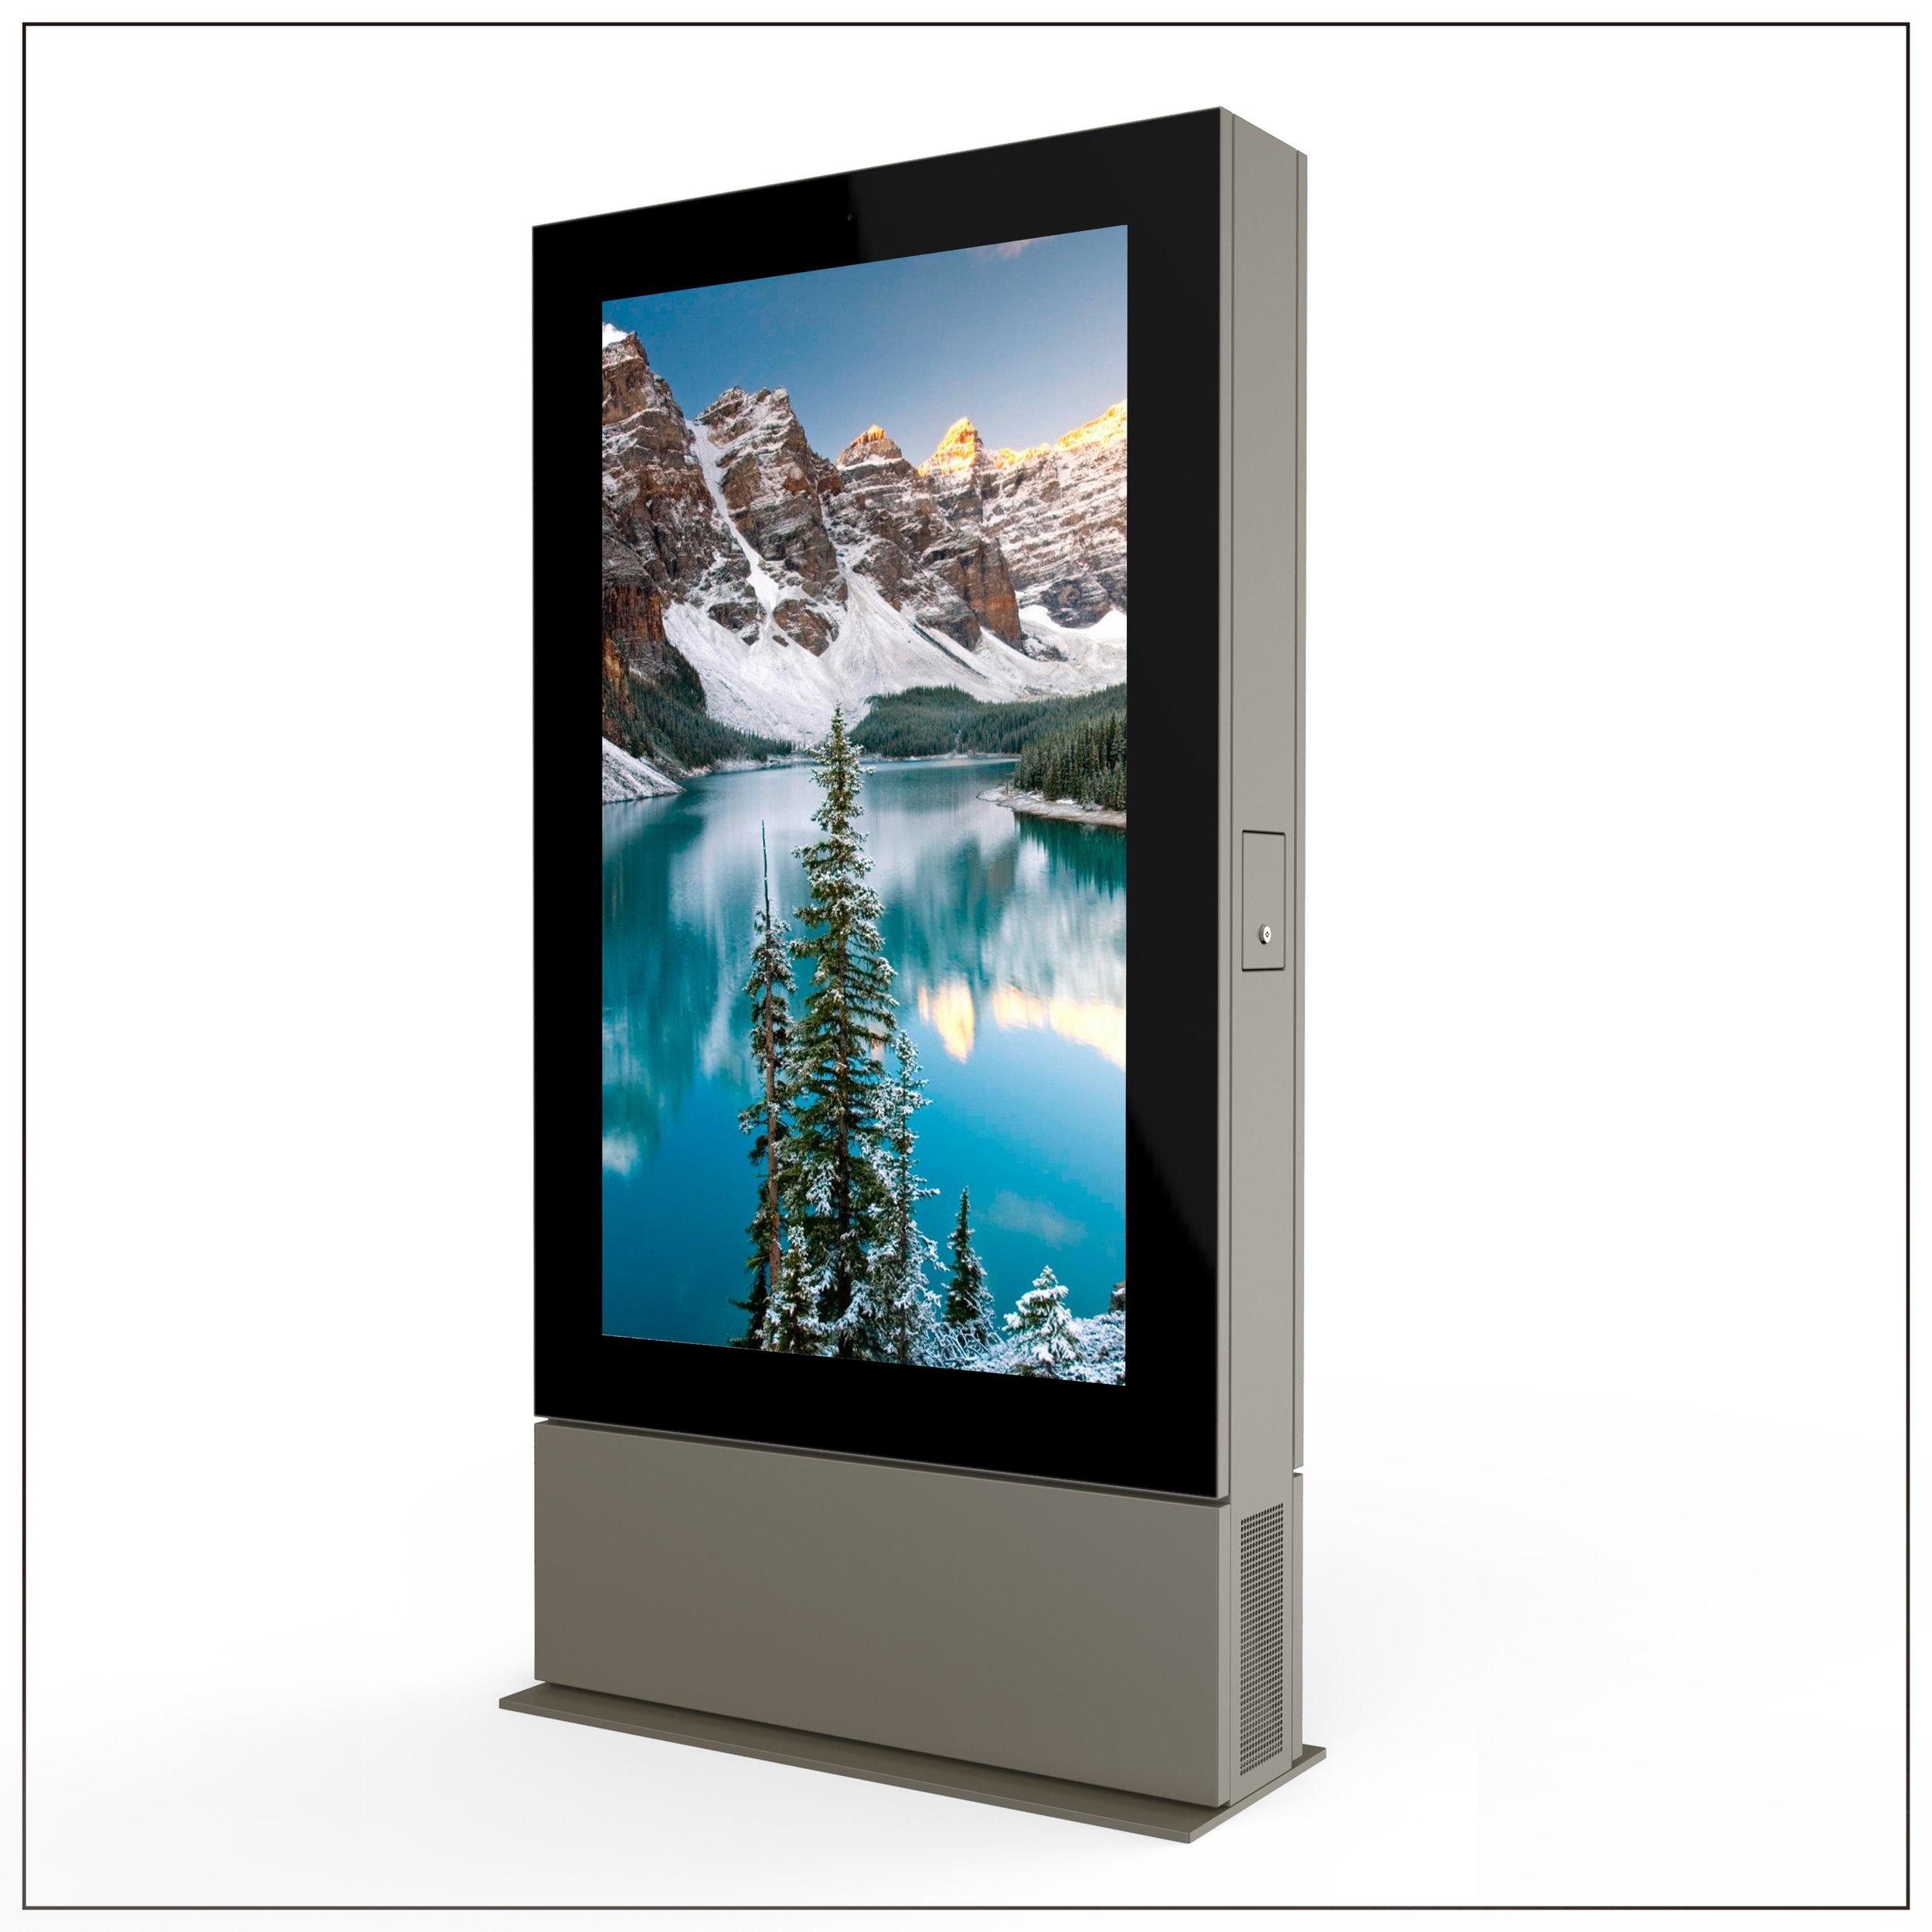 65 inch Liquid Cooled High Brightness LCD Displays